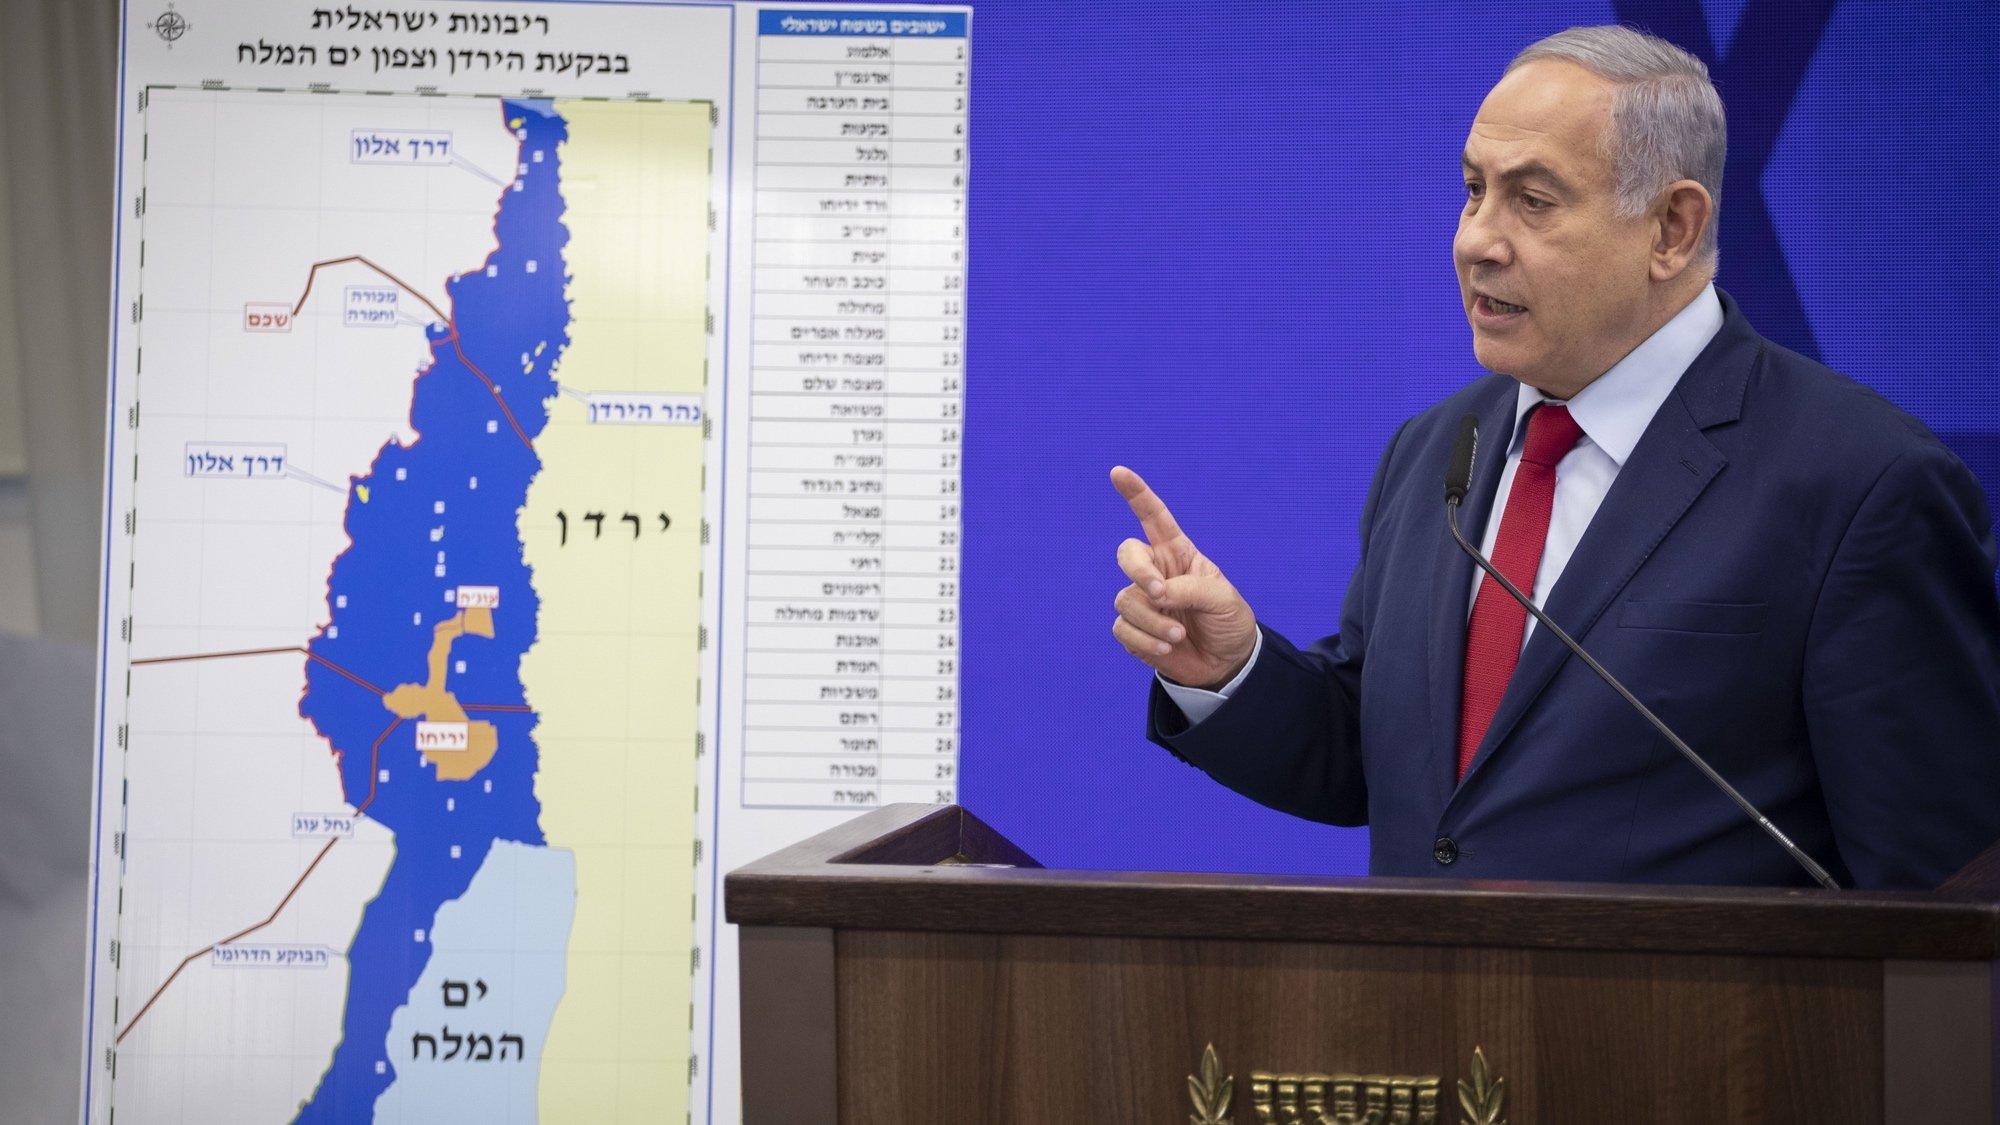 Netanyahu wants to annex the Jordan Valley.